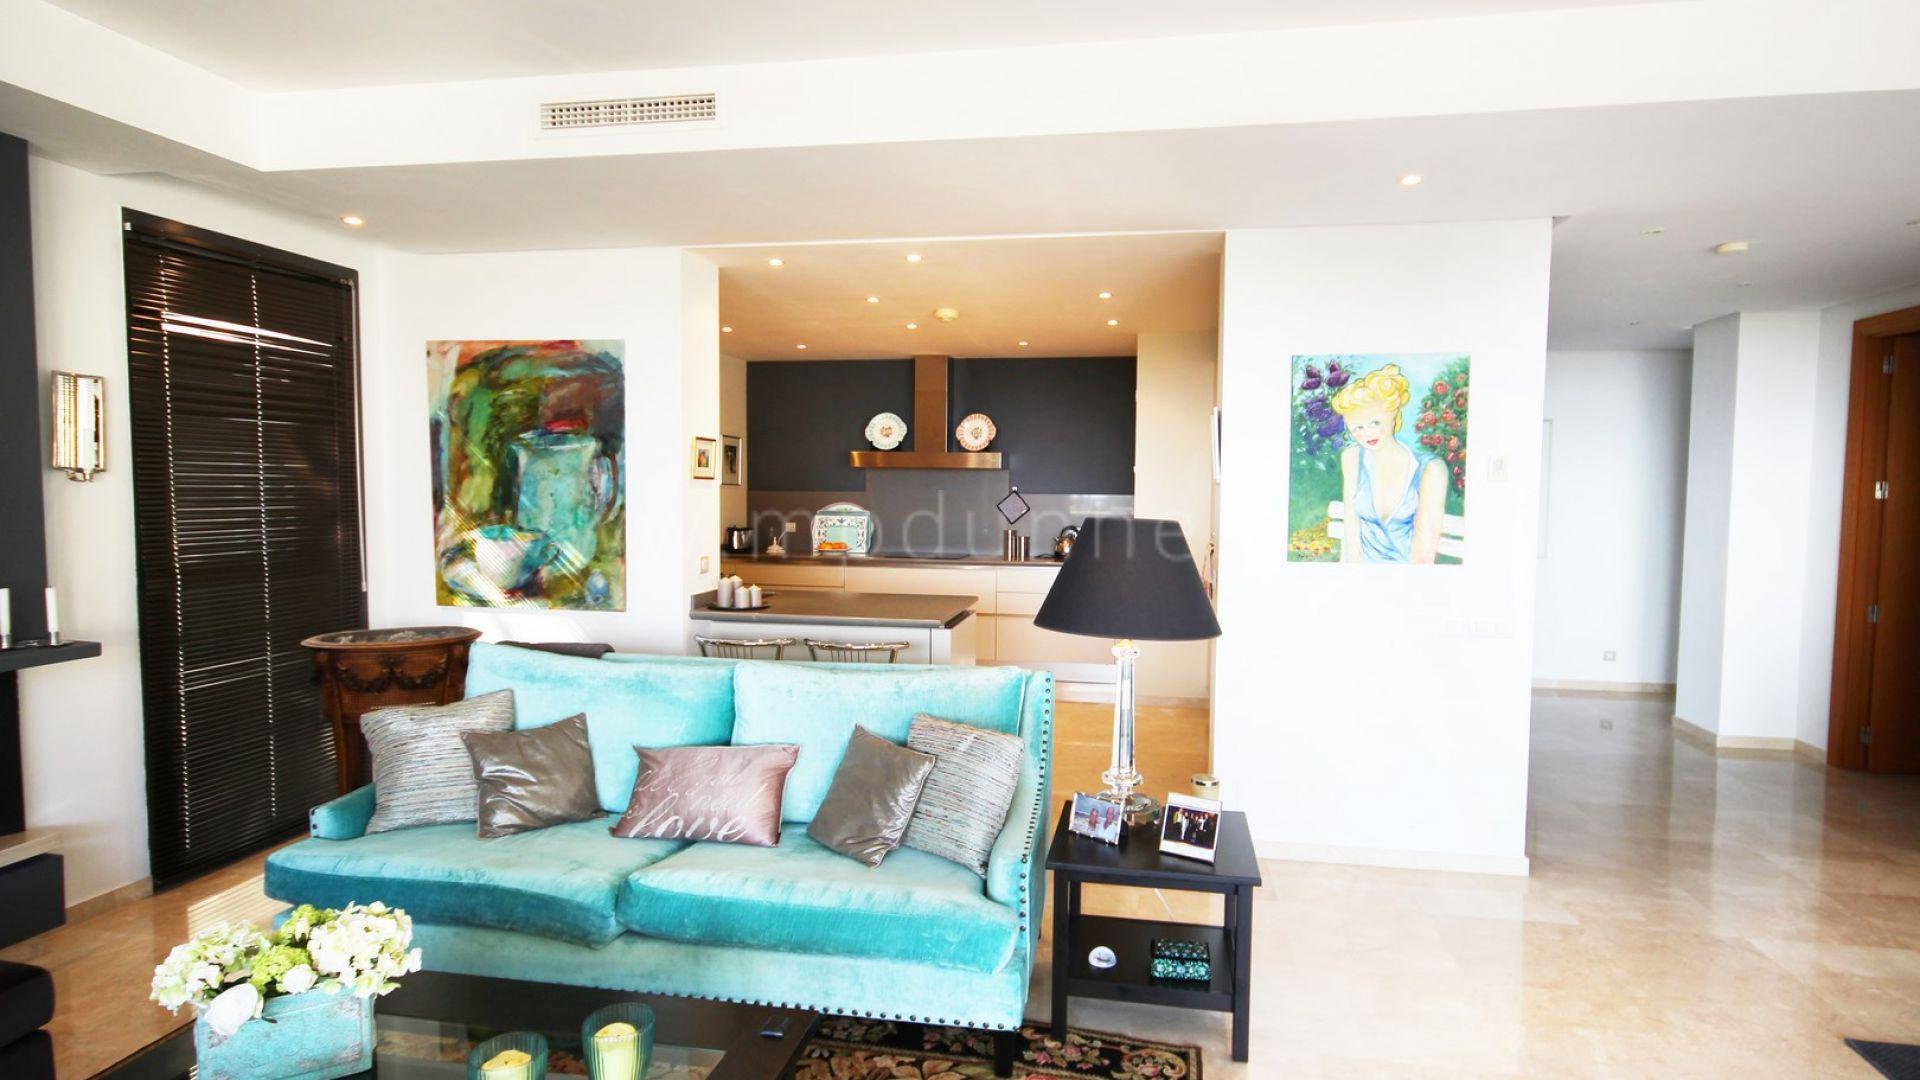 3-bedroom Apartment for Rent in Imara, Marbella Golden Mile